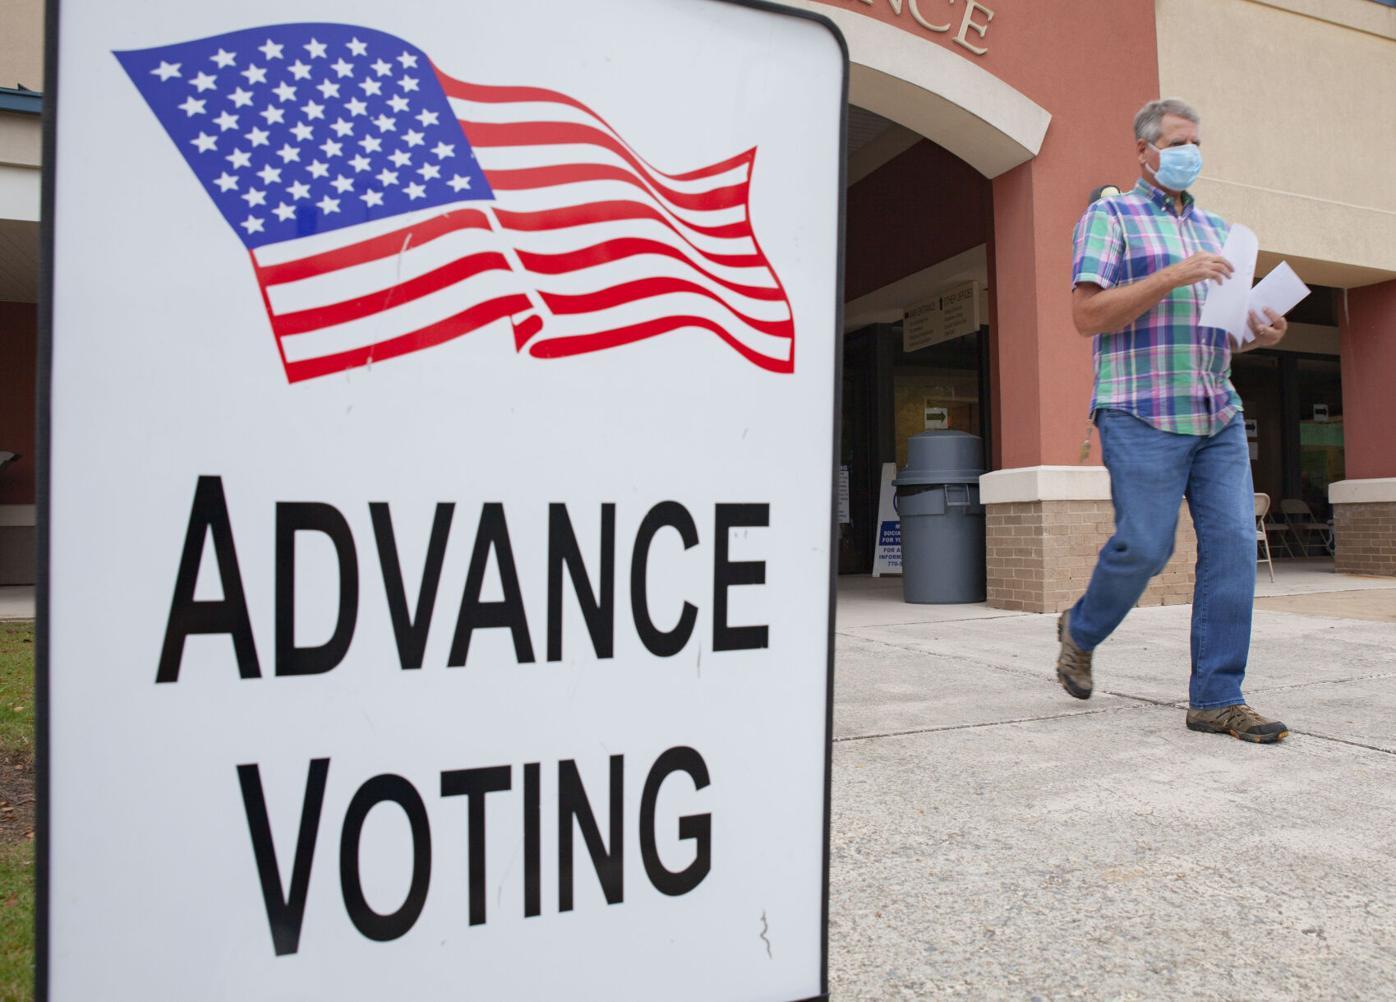 101321_MDJ_Voting2.JPG